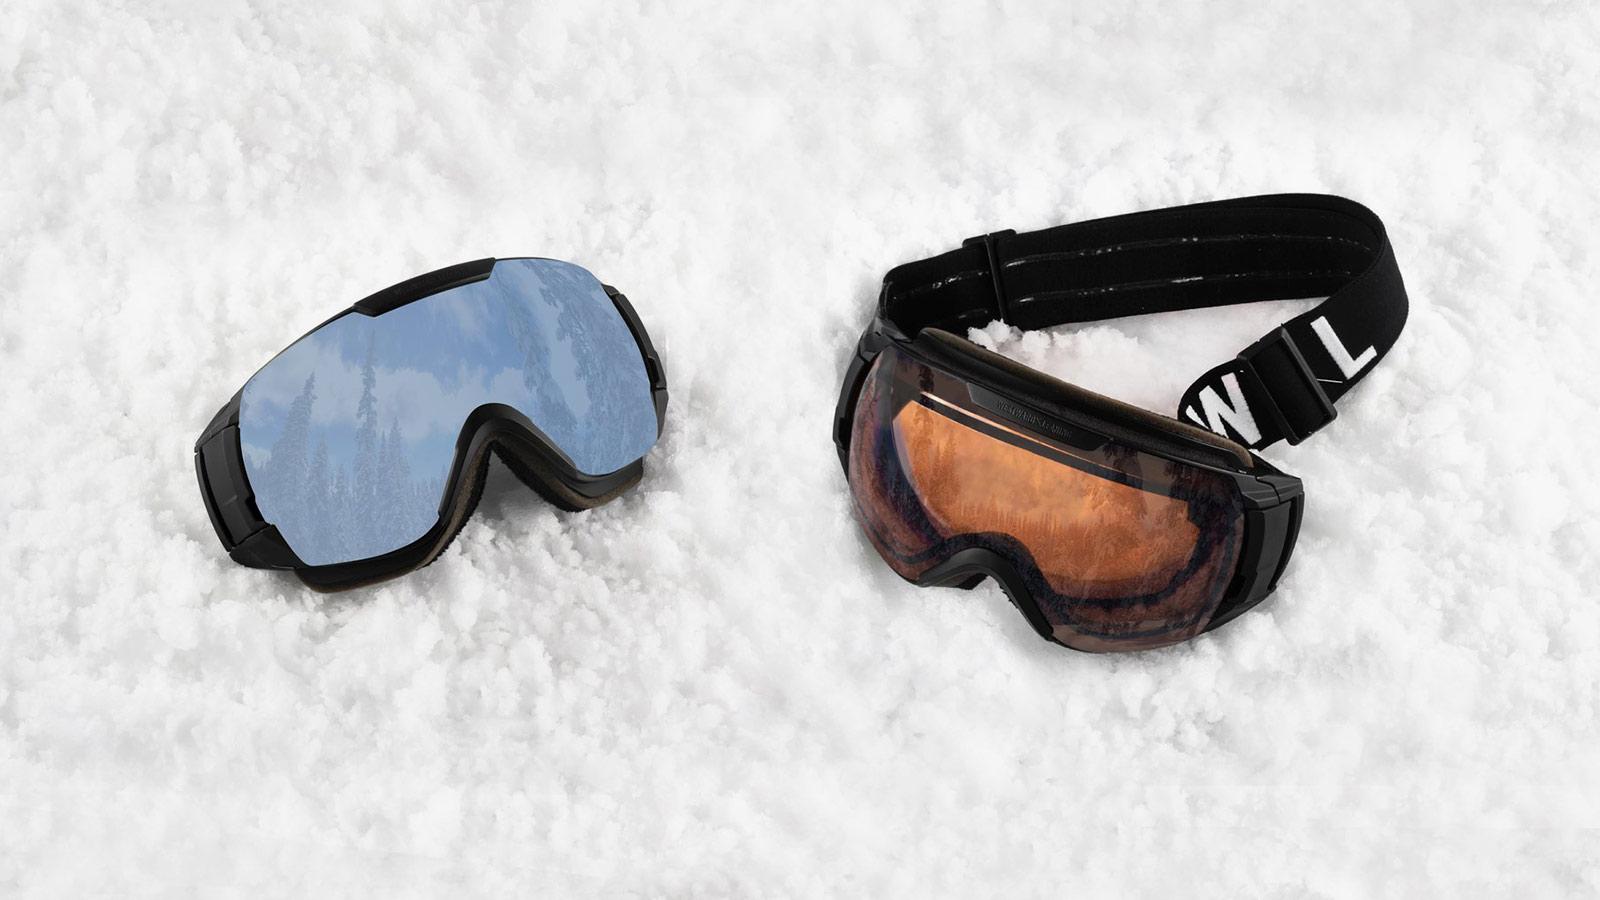 Westward Leaning SKI Goggle